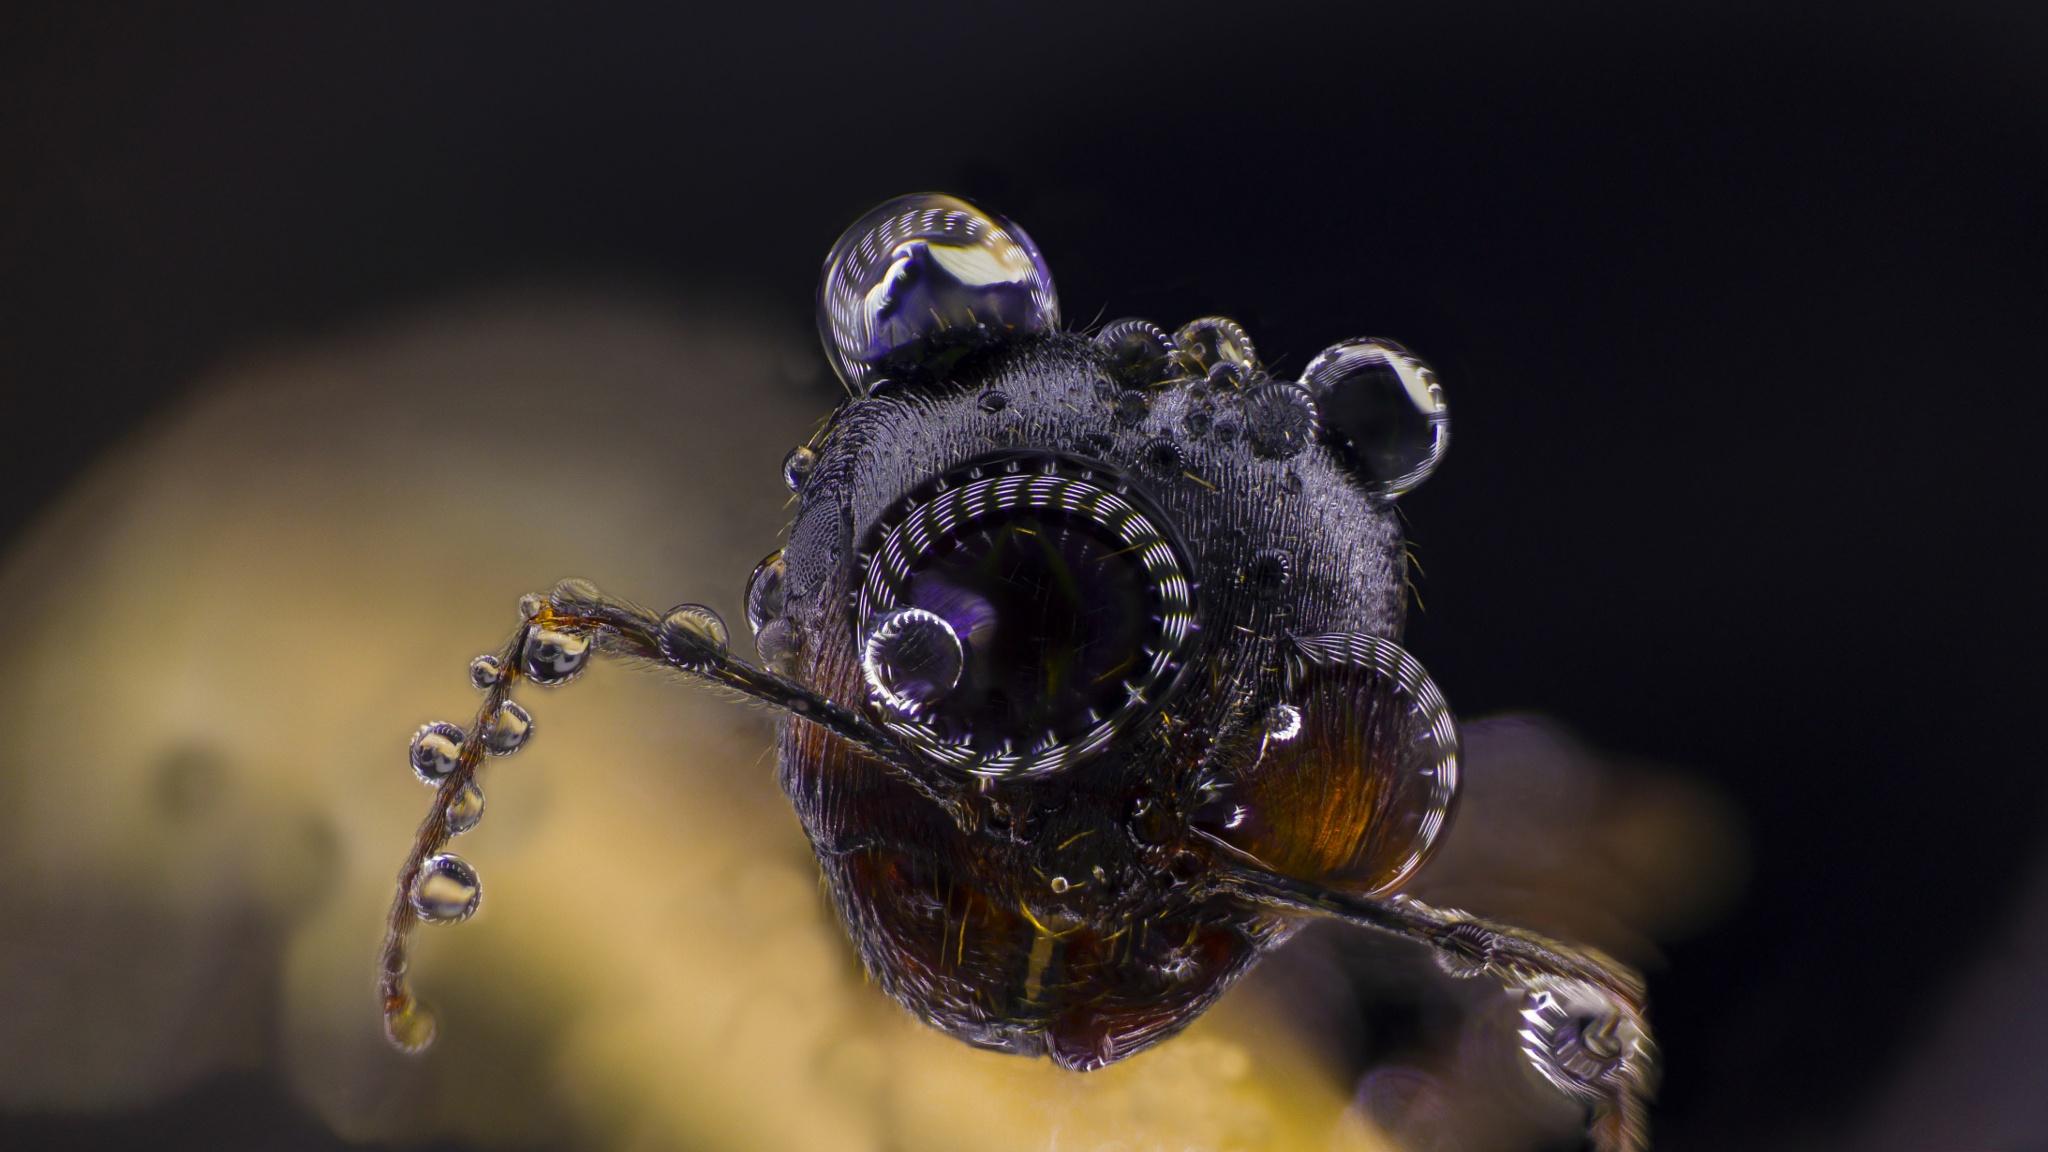 Ant by Tsvetan Ganev-CECLII